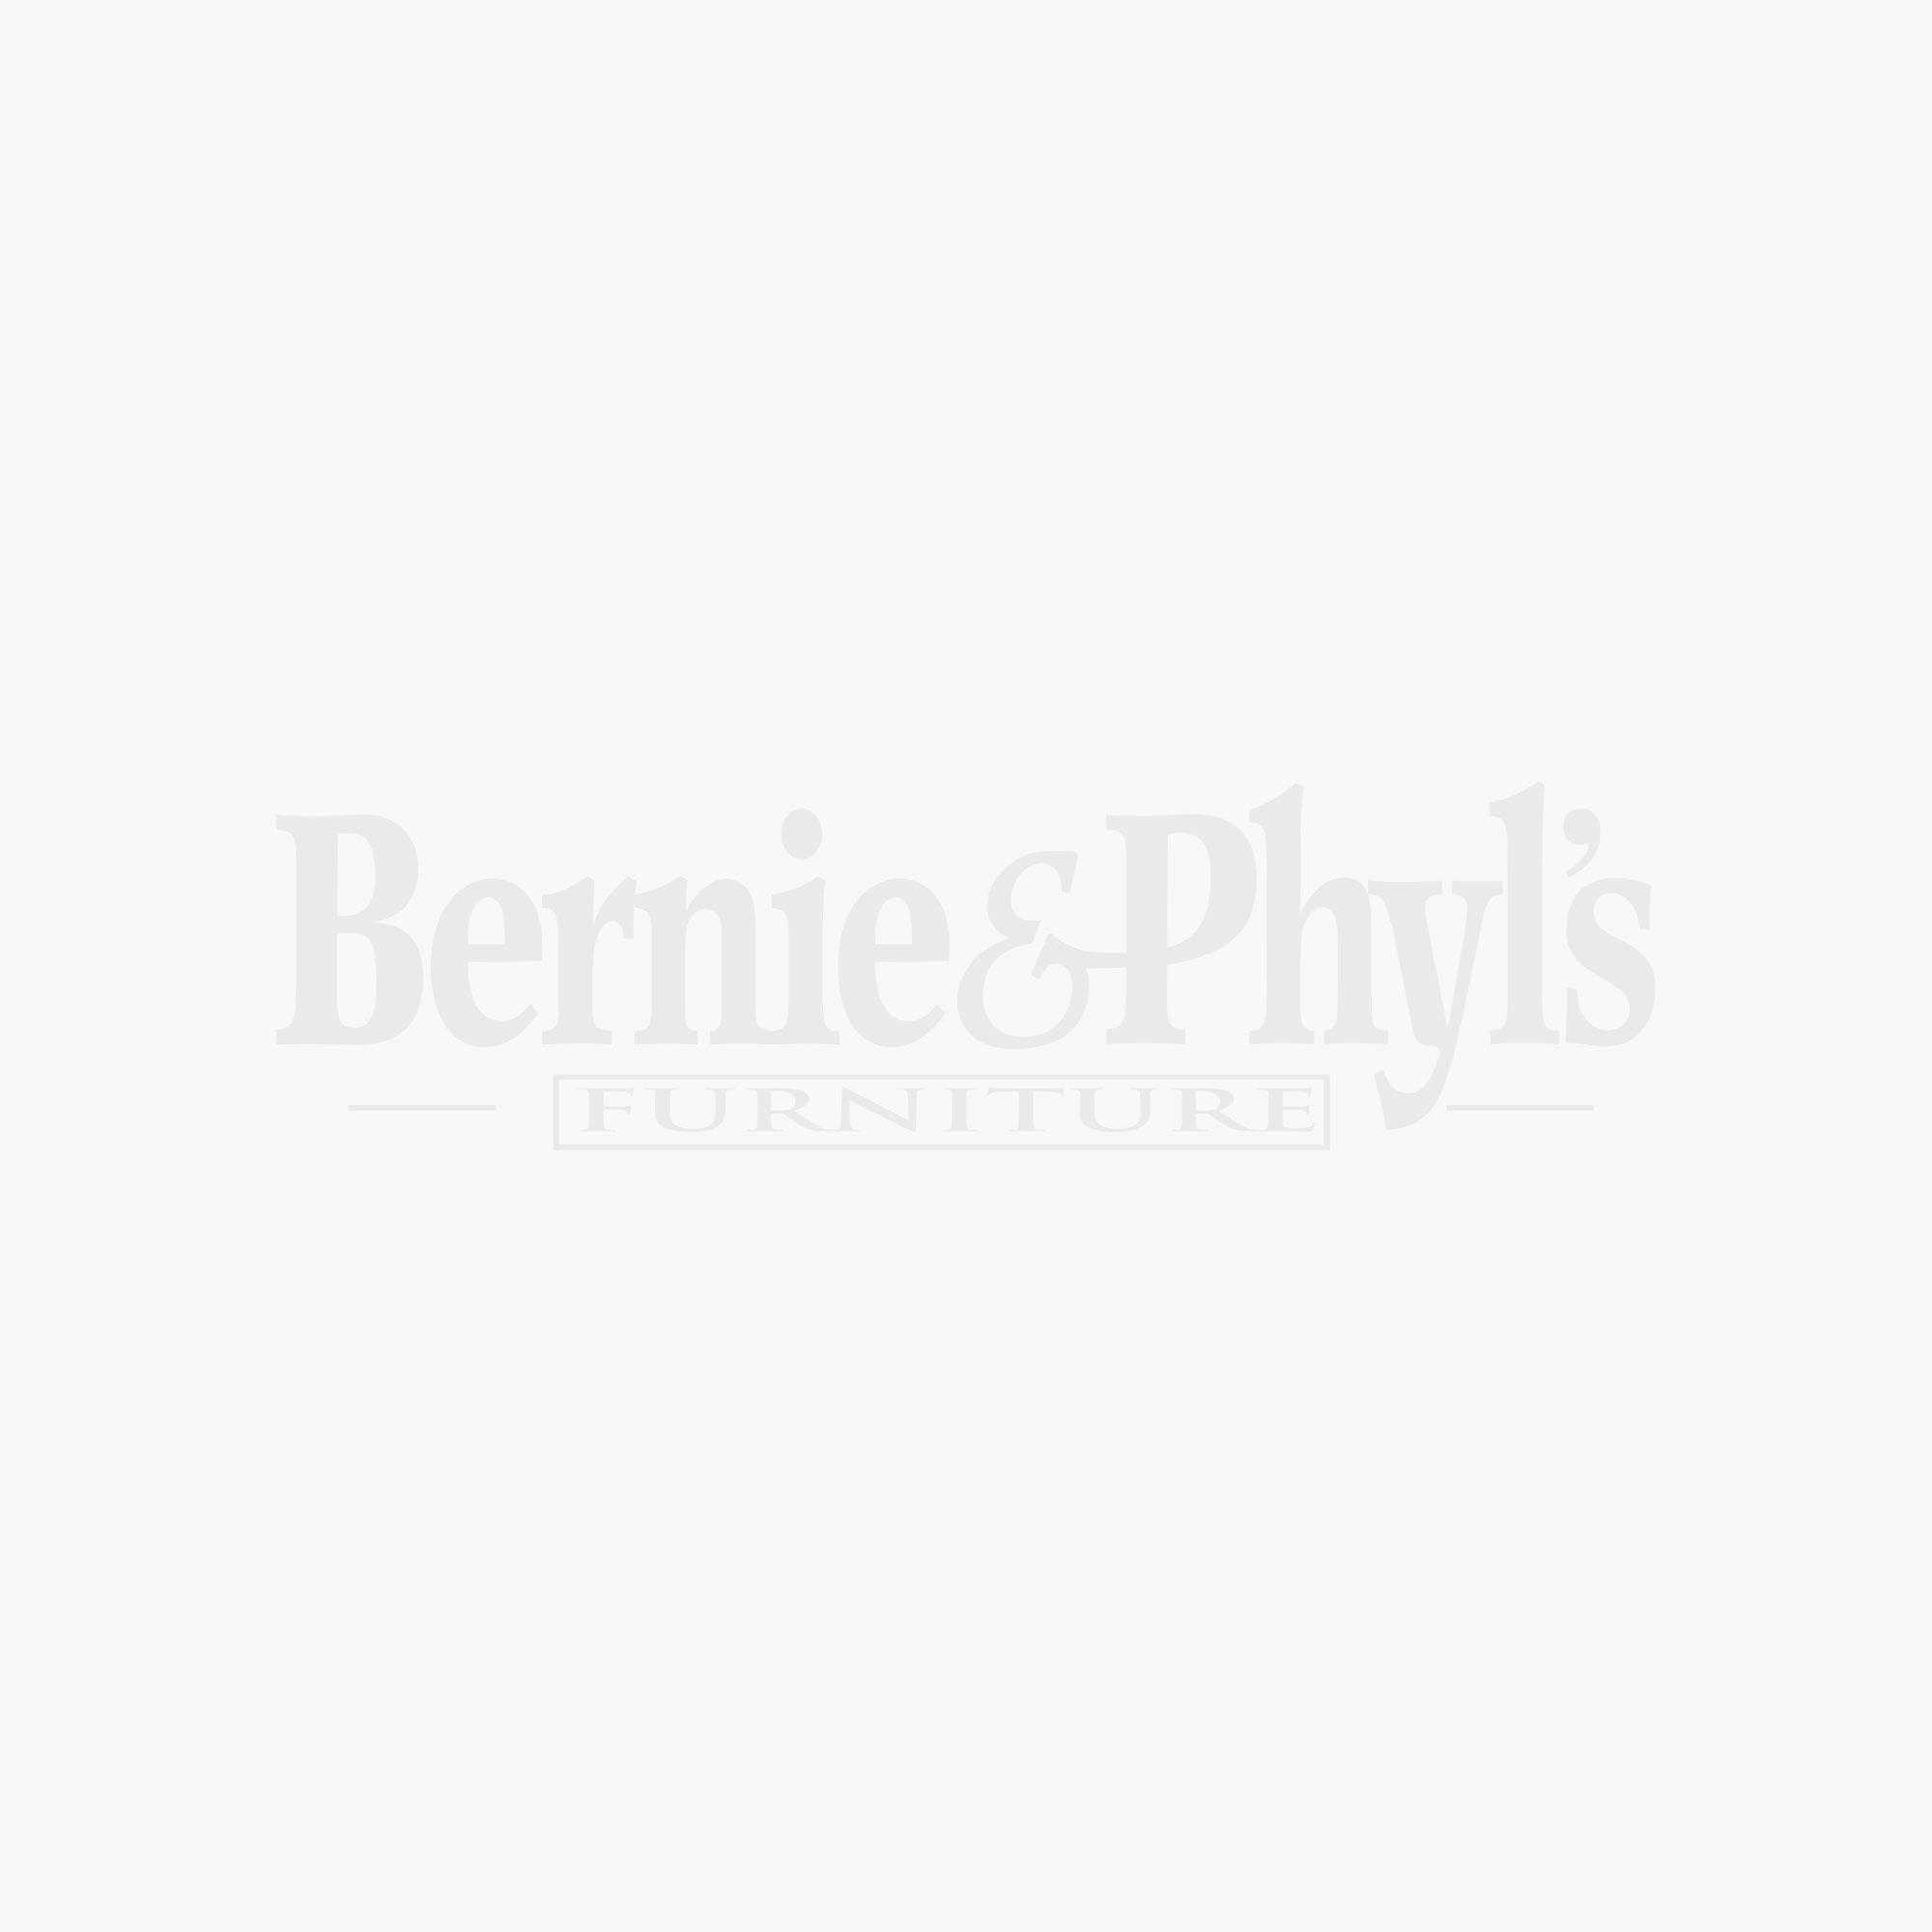 Ikon Power Recliner  sc 1 st  Bernie u0026 Phylu0027s Furniture & Ikon Power Recliner - Bernie u0026 Phylu0027s Furniture - by Klaussner ... islam-shia.org